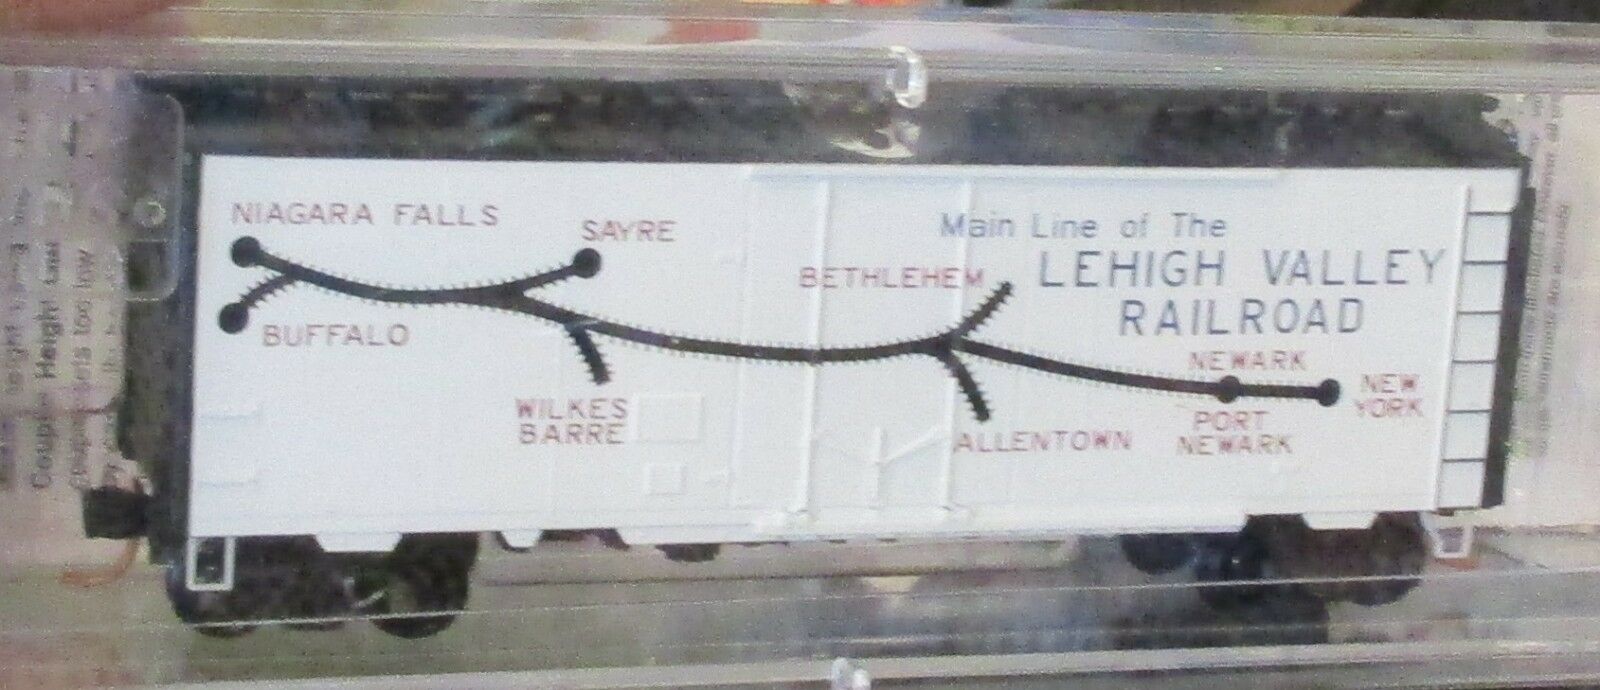 NSE 11-01 LEHIGH VALLEY BILLBOARD  40' BOXCAR  MTL MICRO TRAINS N SCALE